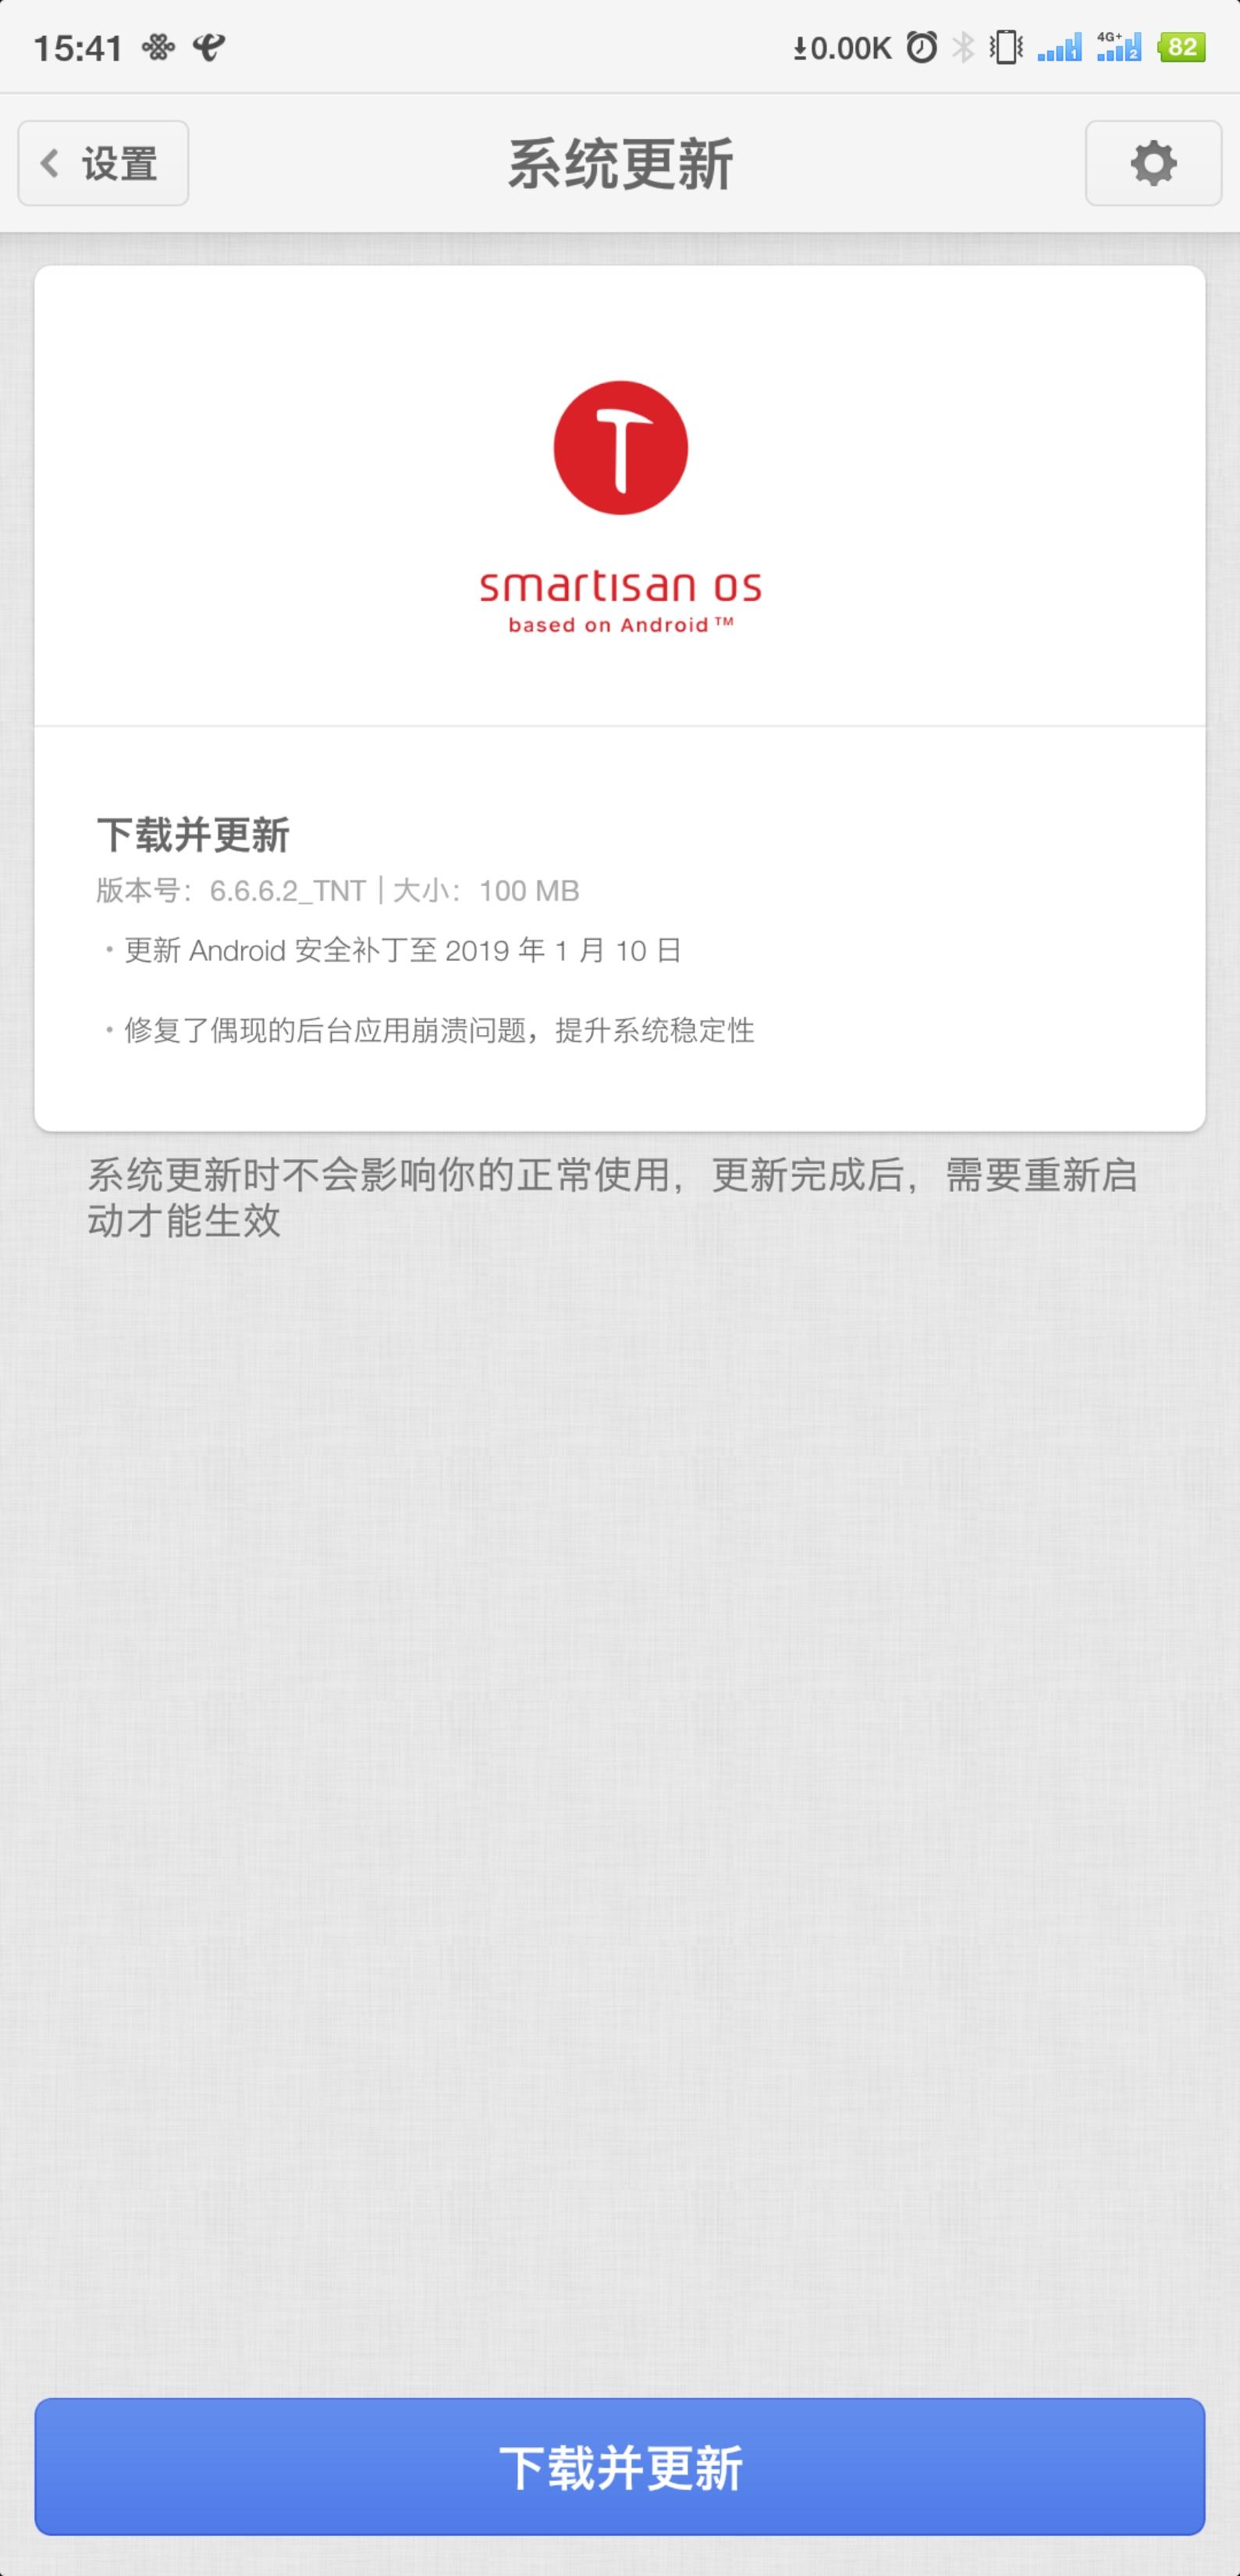 Screenshot_2019-04-04-15-41-33-029_??.png